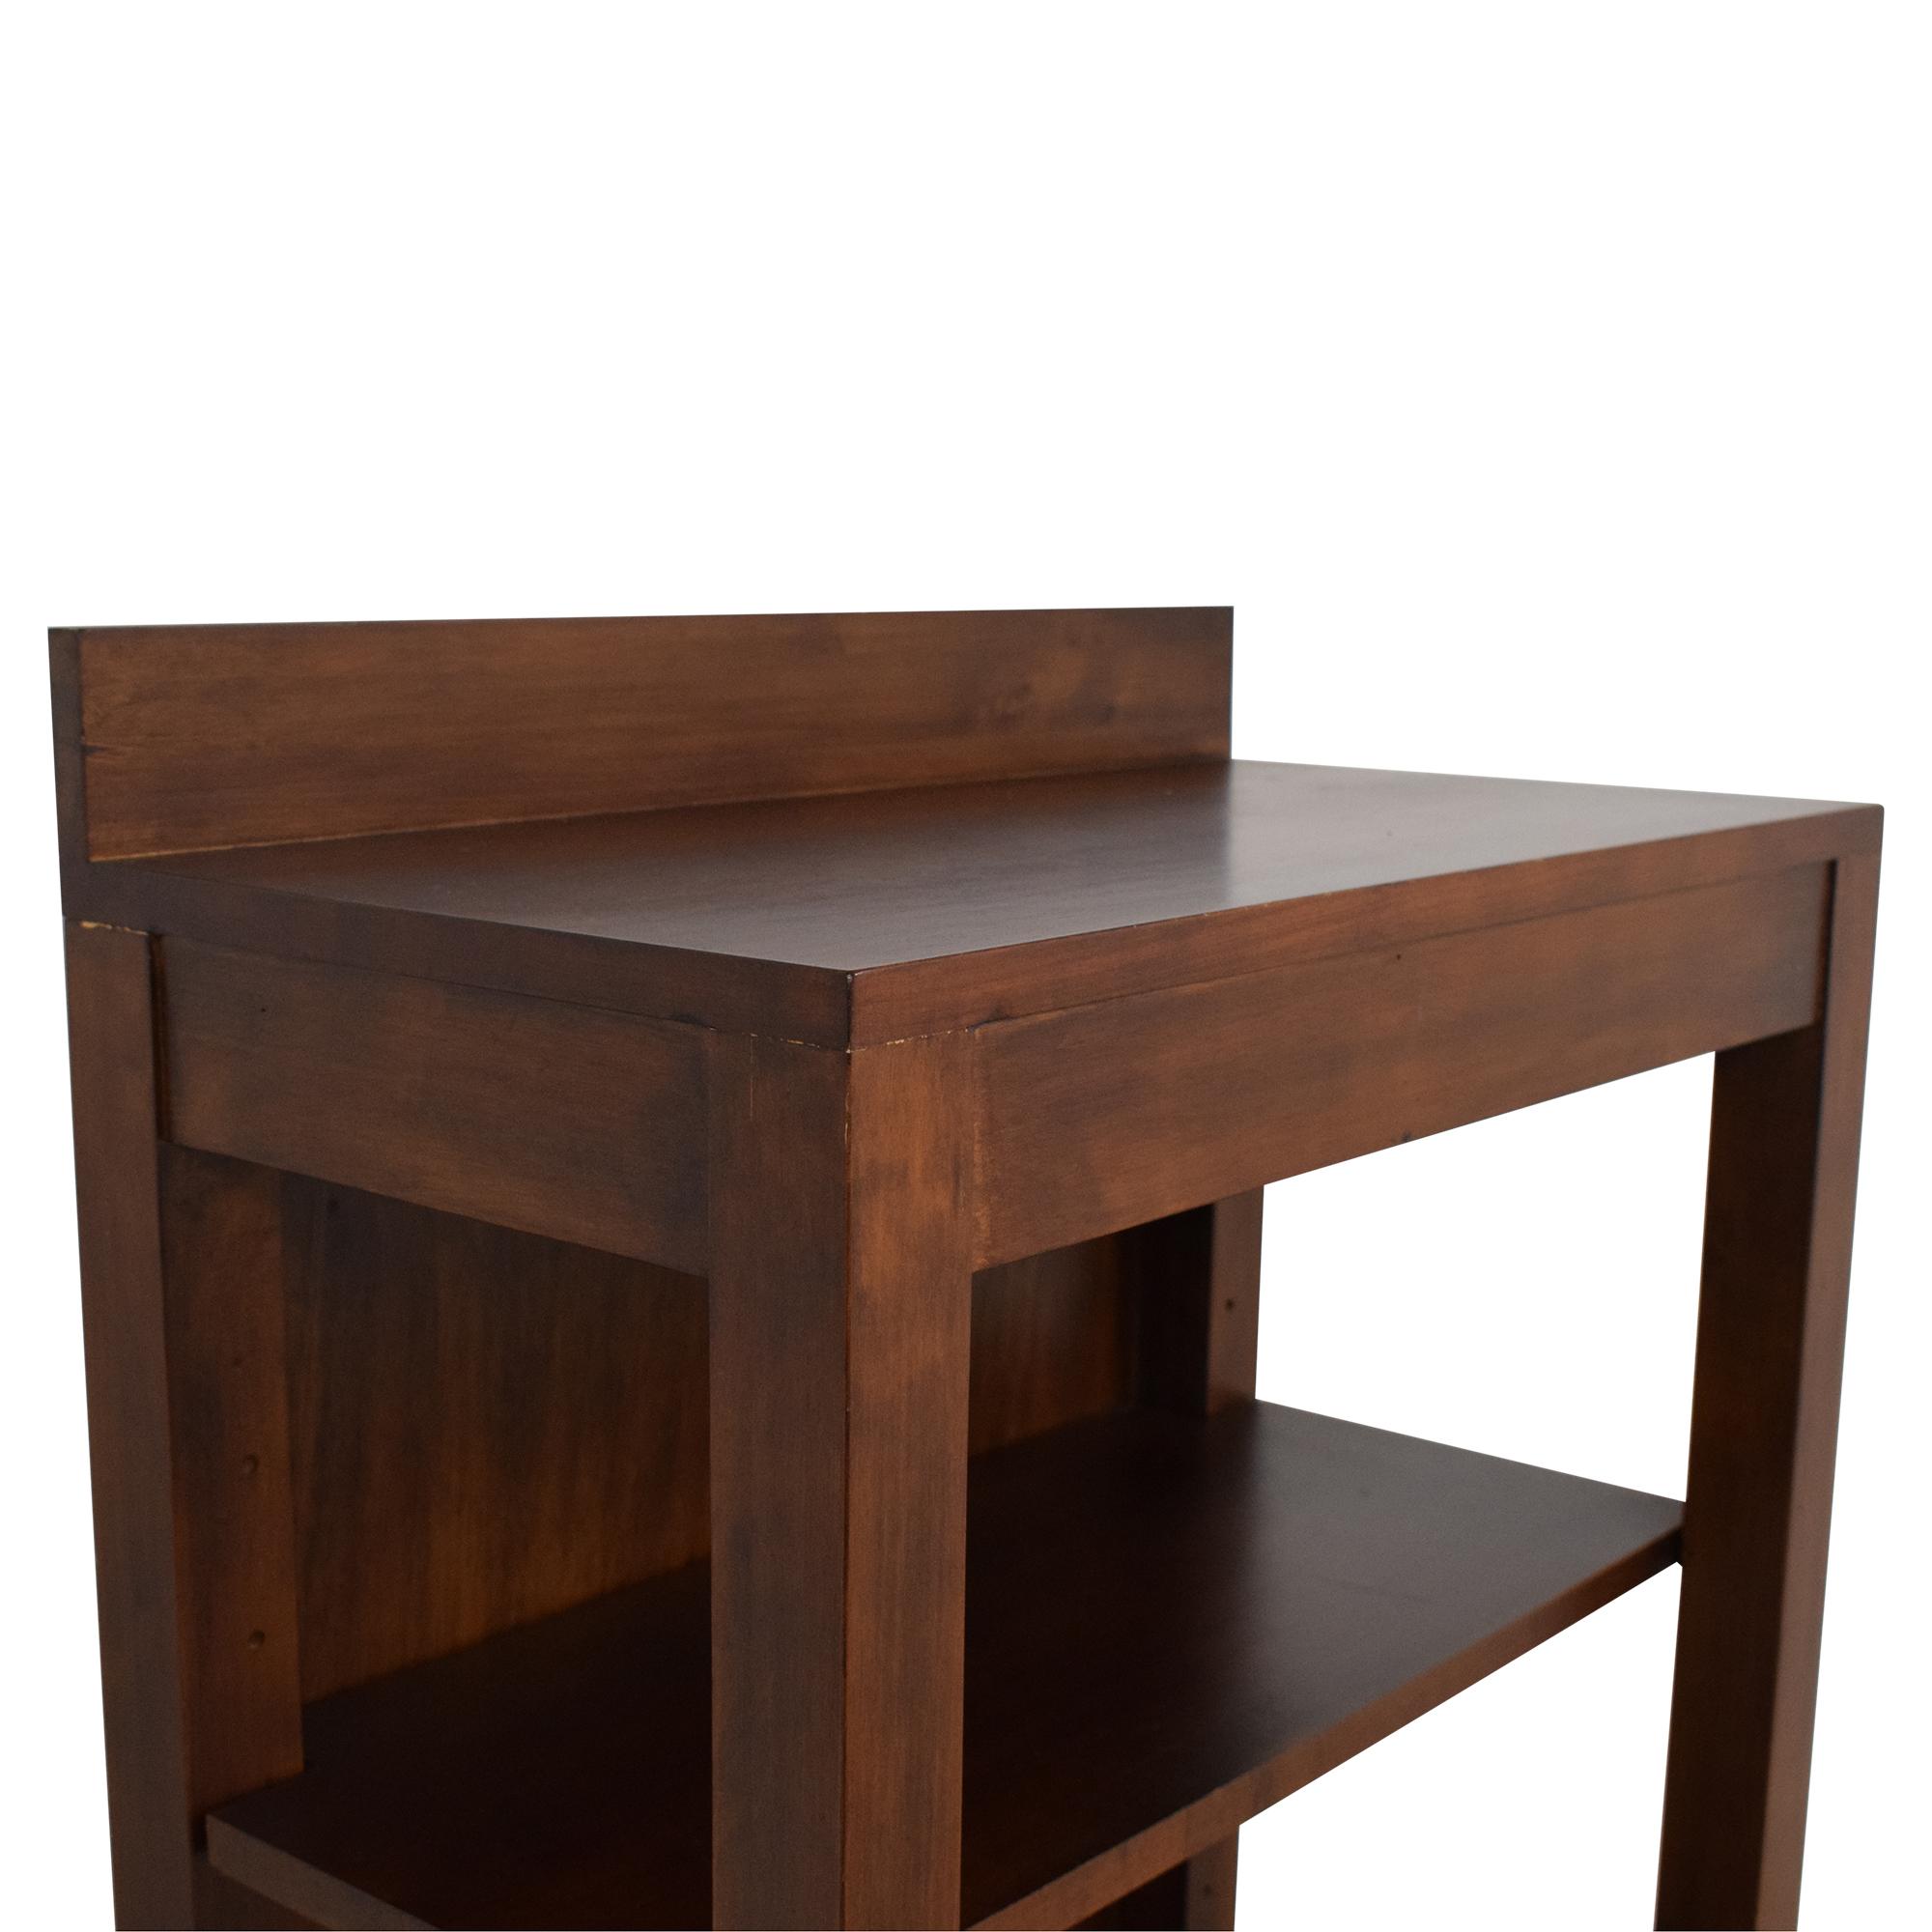 Romweber Romweber by Jim Peed Modern Bookcase Bookcases & Shelving